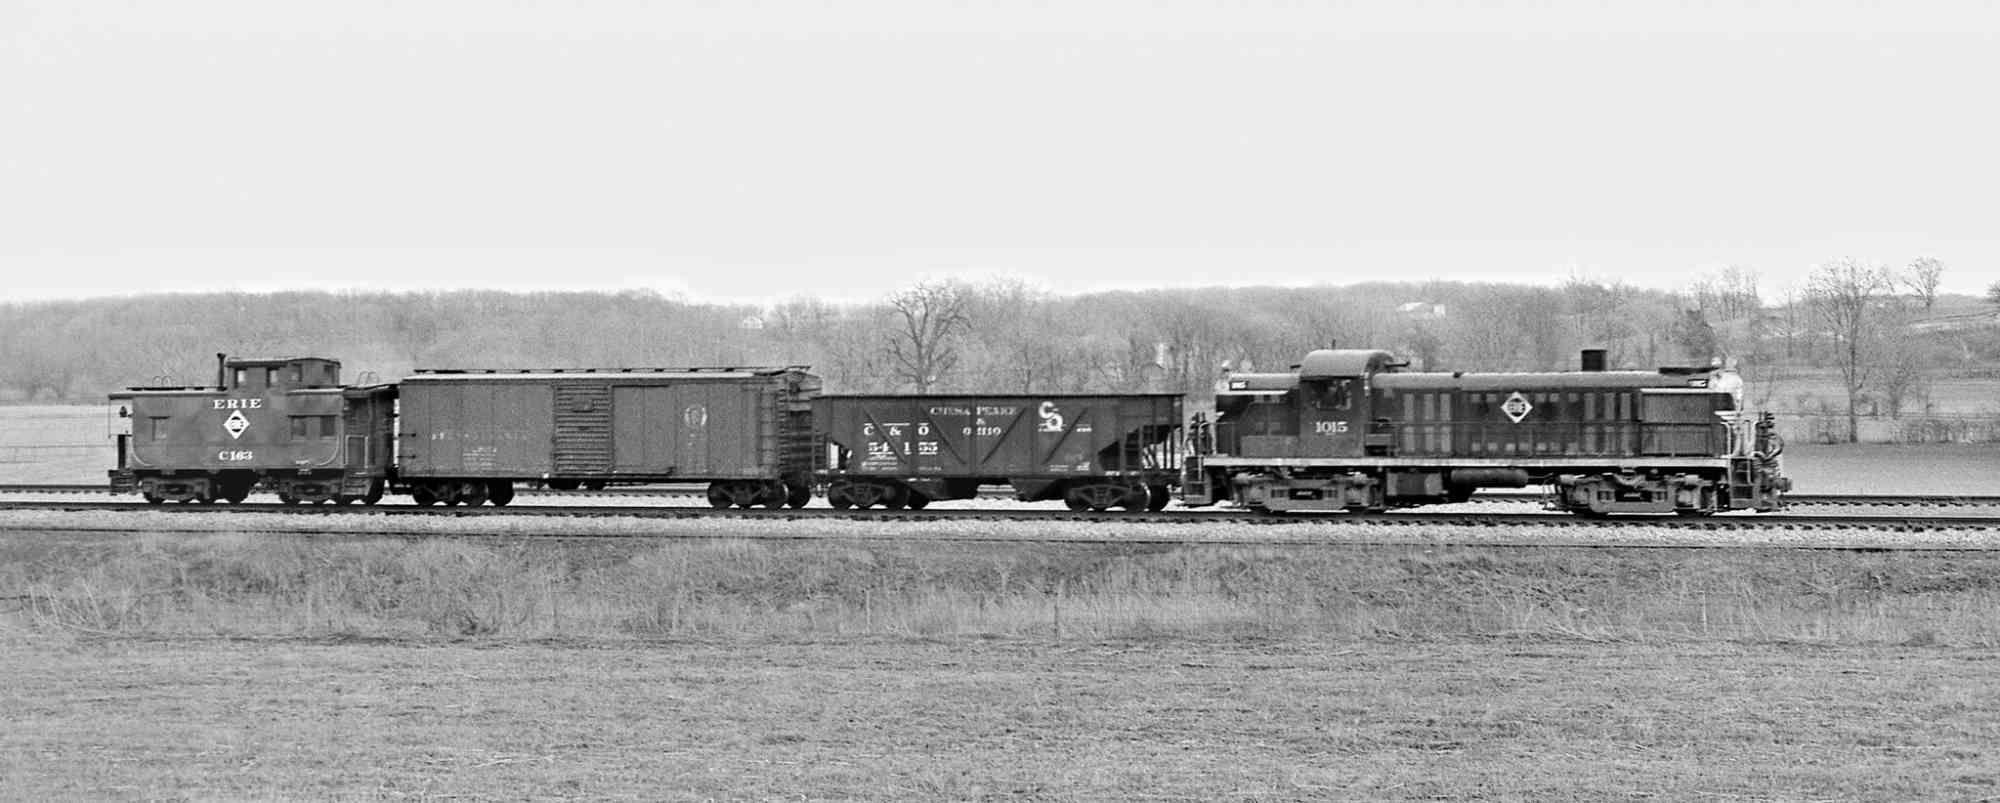 ERIE, Fairborn, Ohio, 1956 Railroad photography